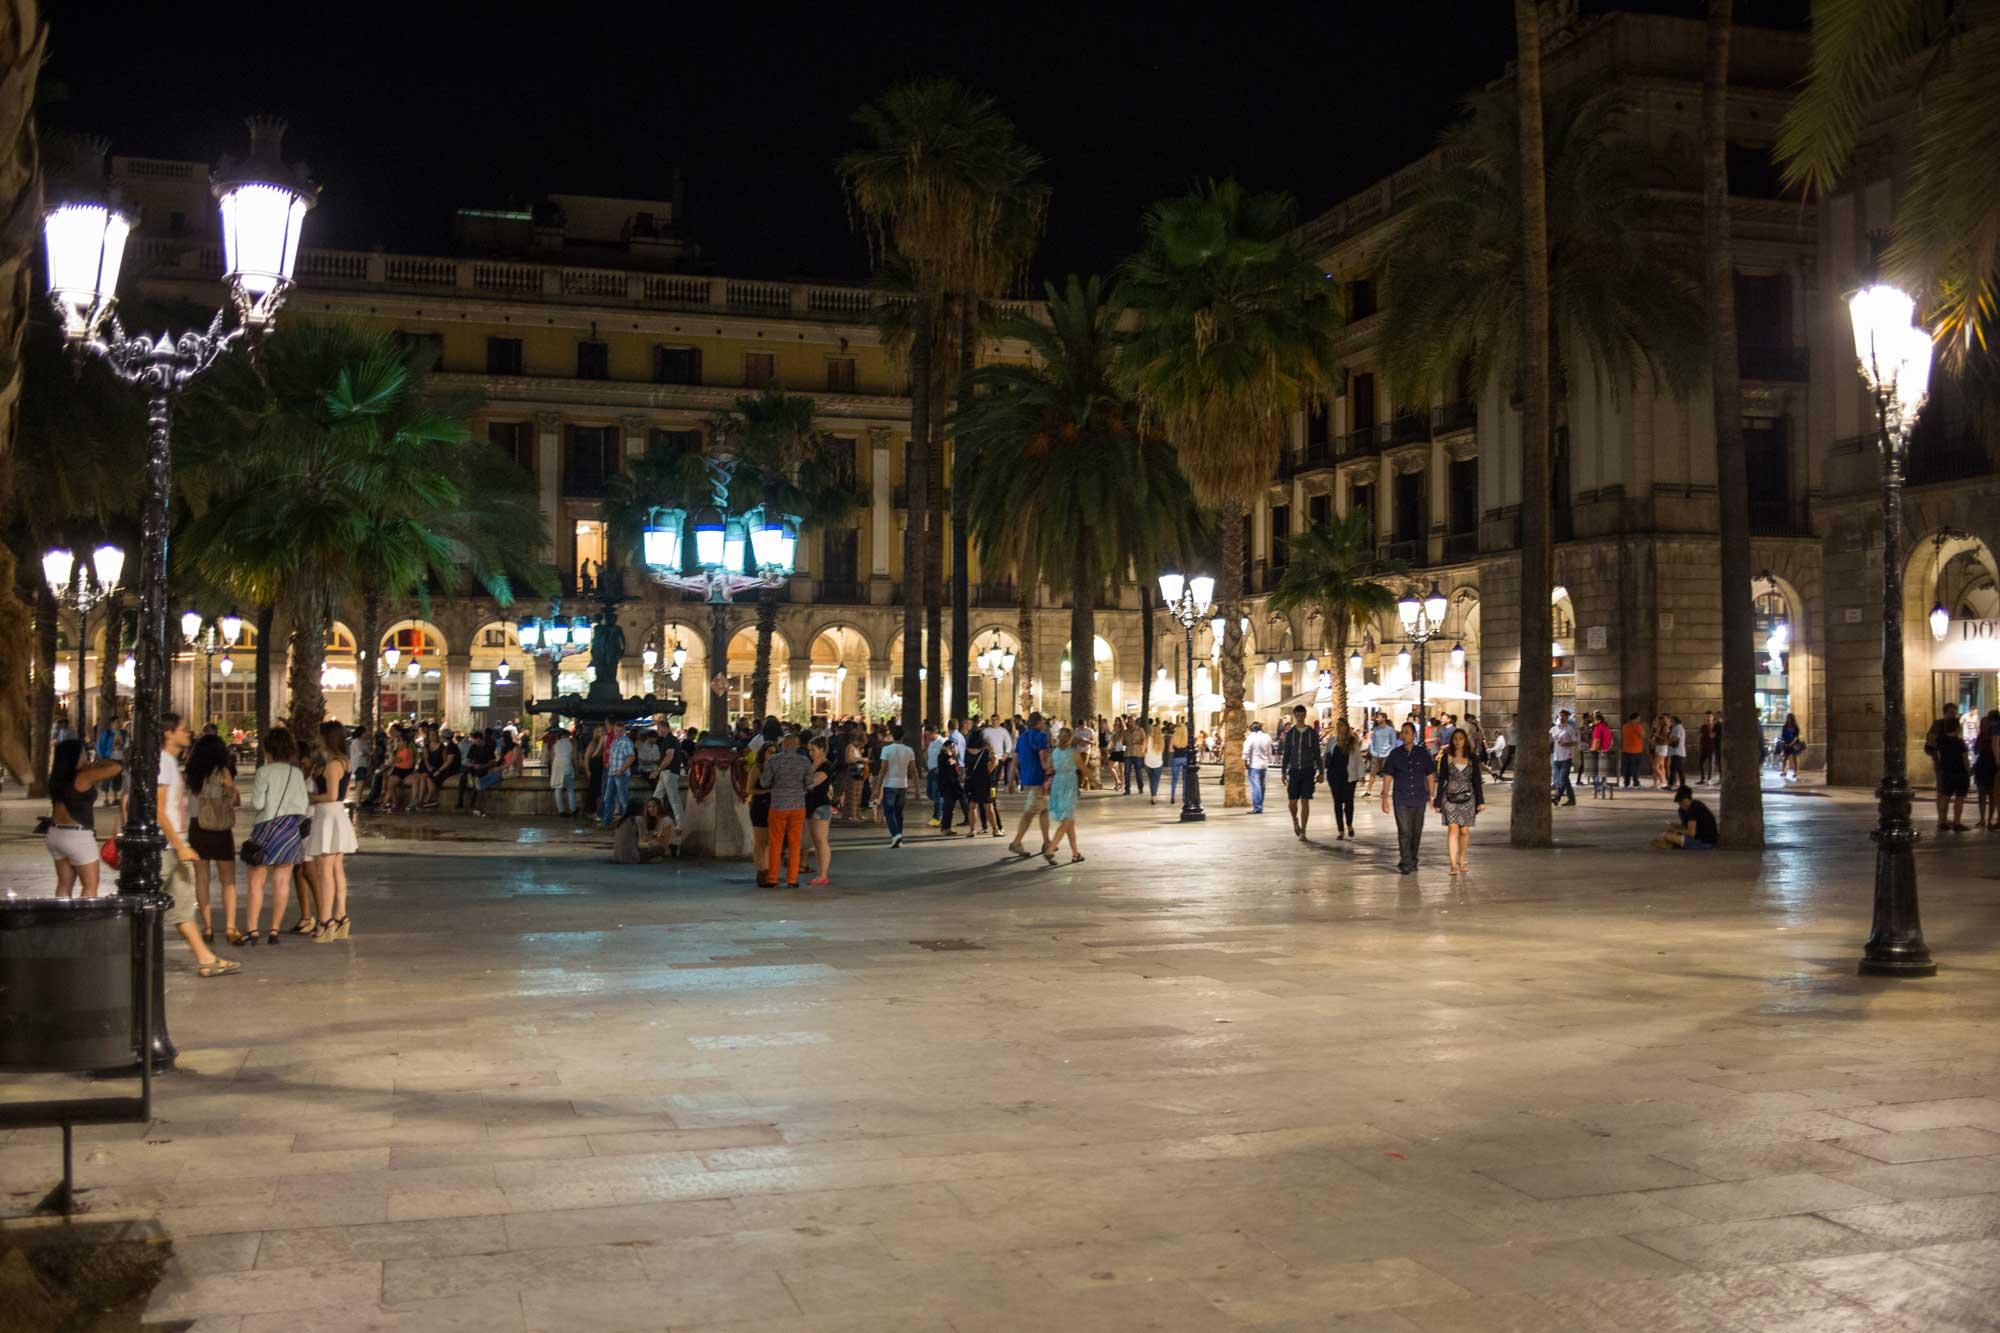 Placa-Reial-Barcelona-ckstenberg-7469.jpg